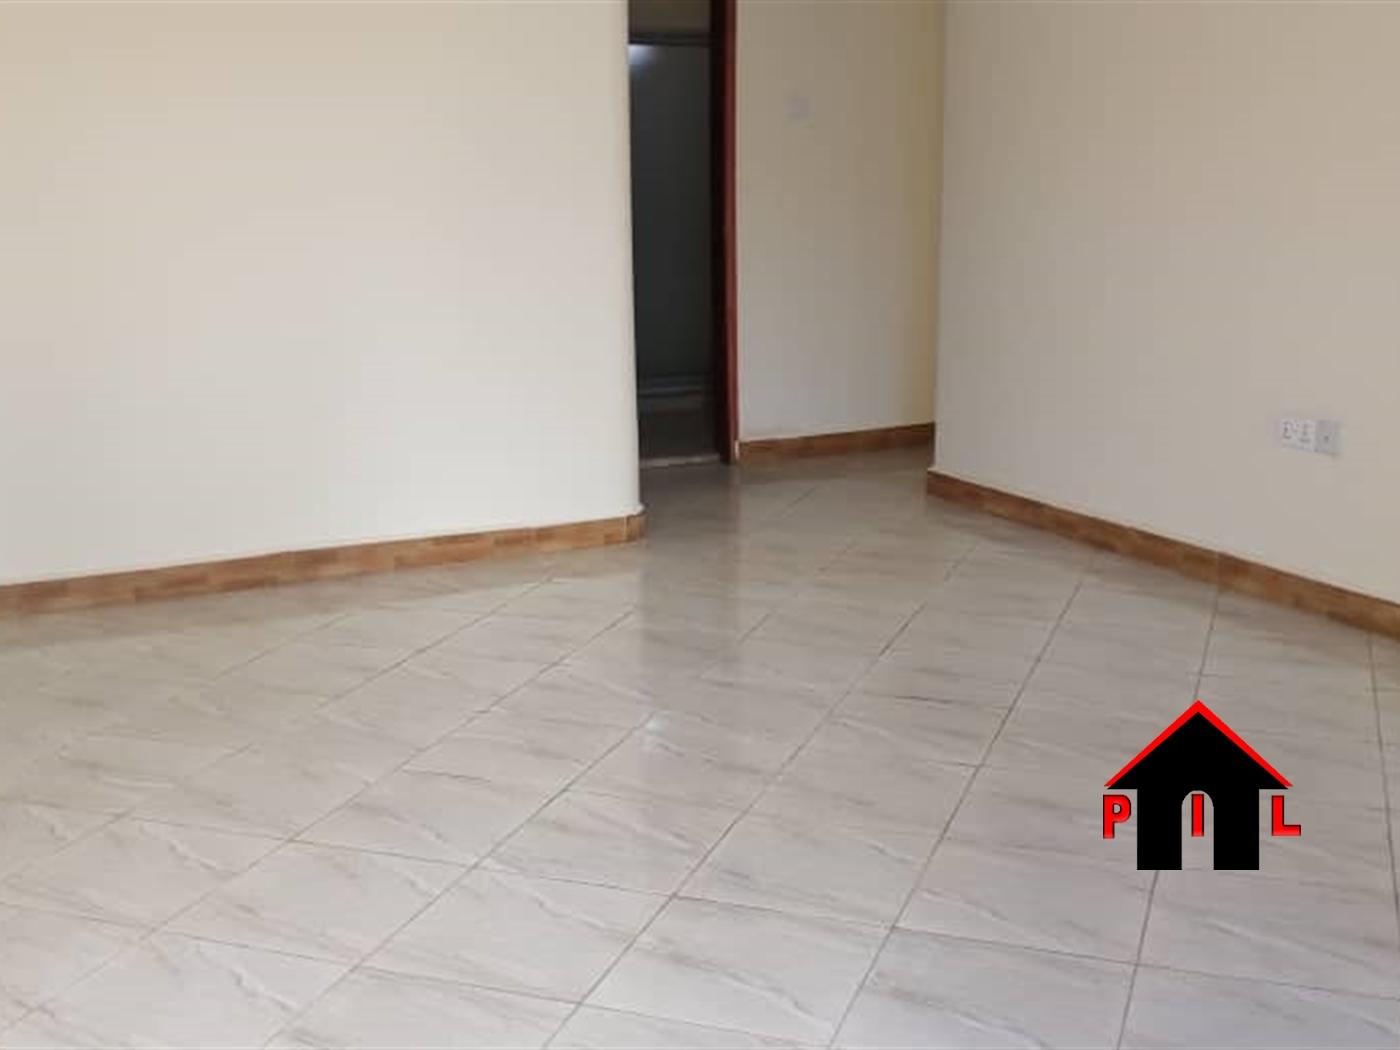 Apartment for rent in Najjera Kampala